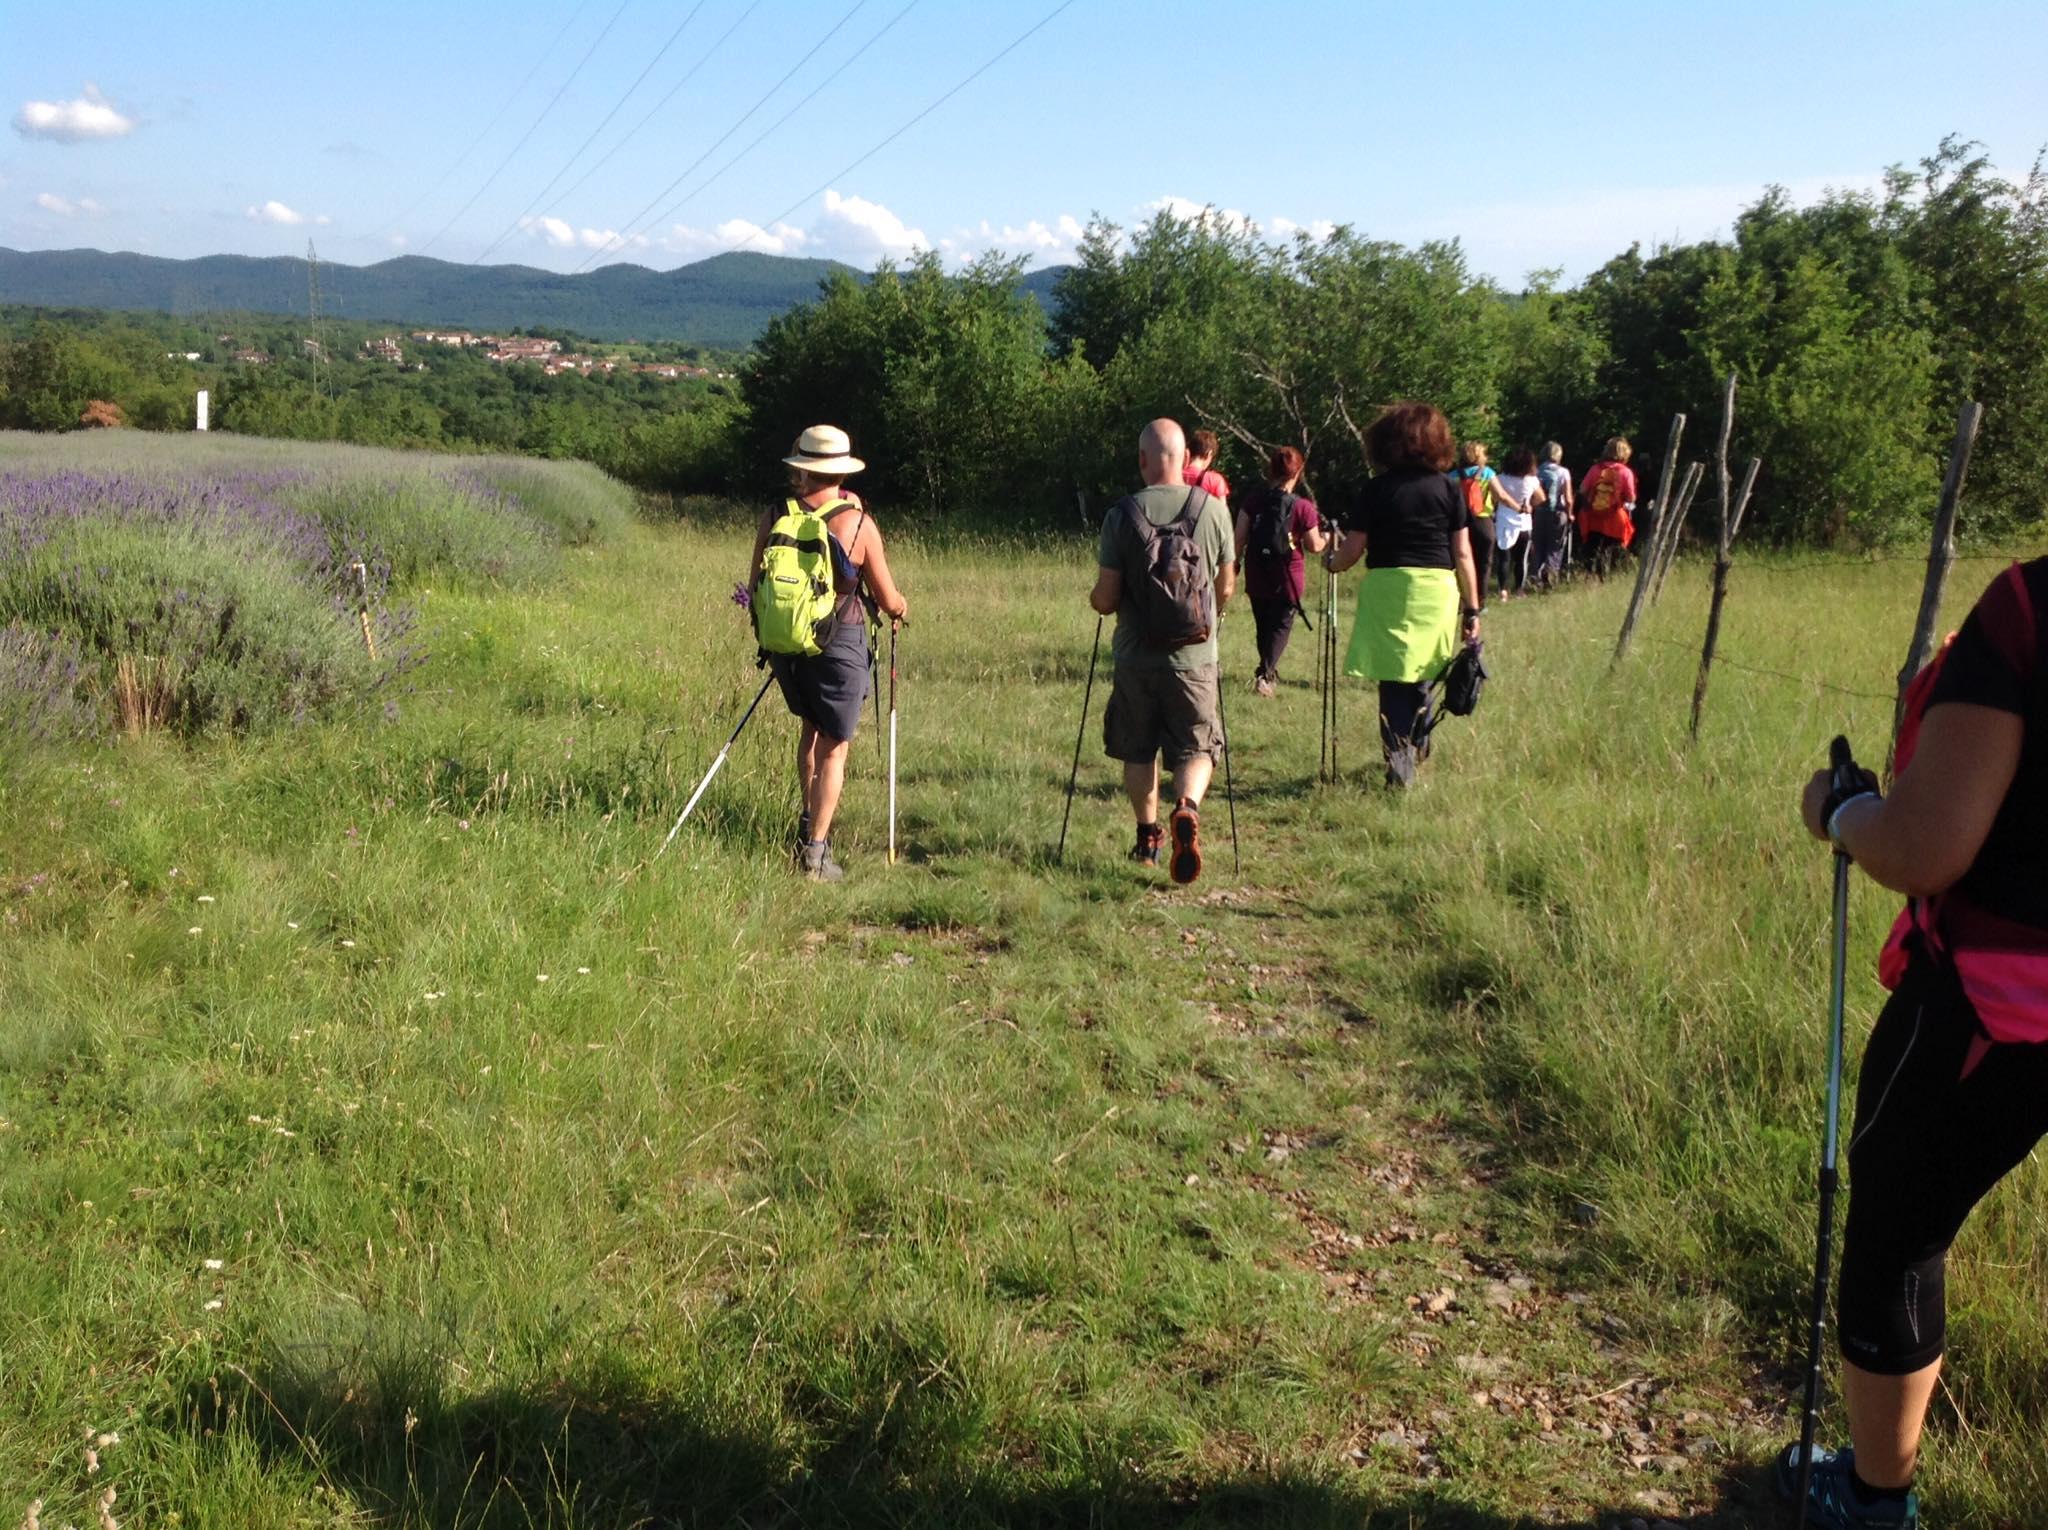 2020-06-17 Nordic Walking - Gorjansko-Ivanij Grad (S) (2)